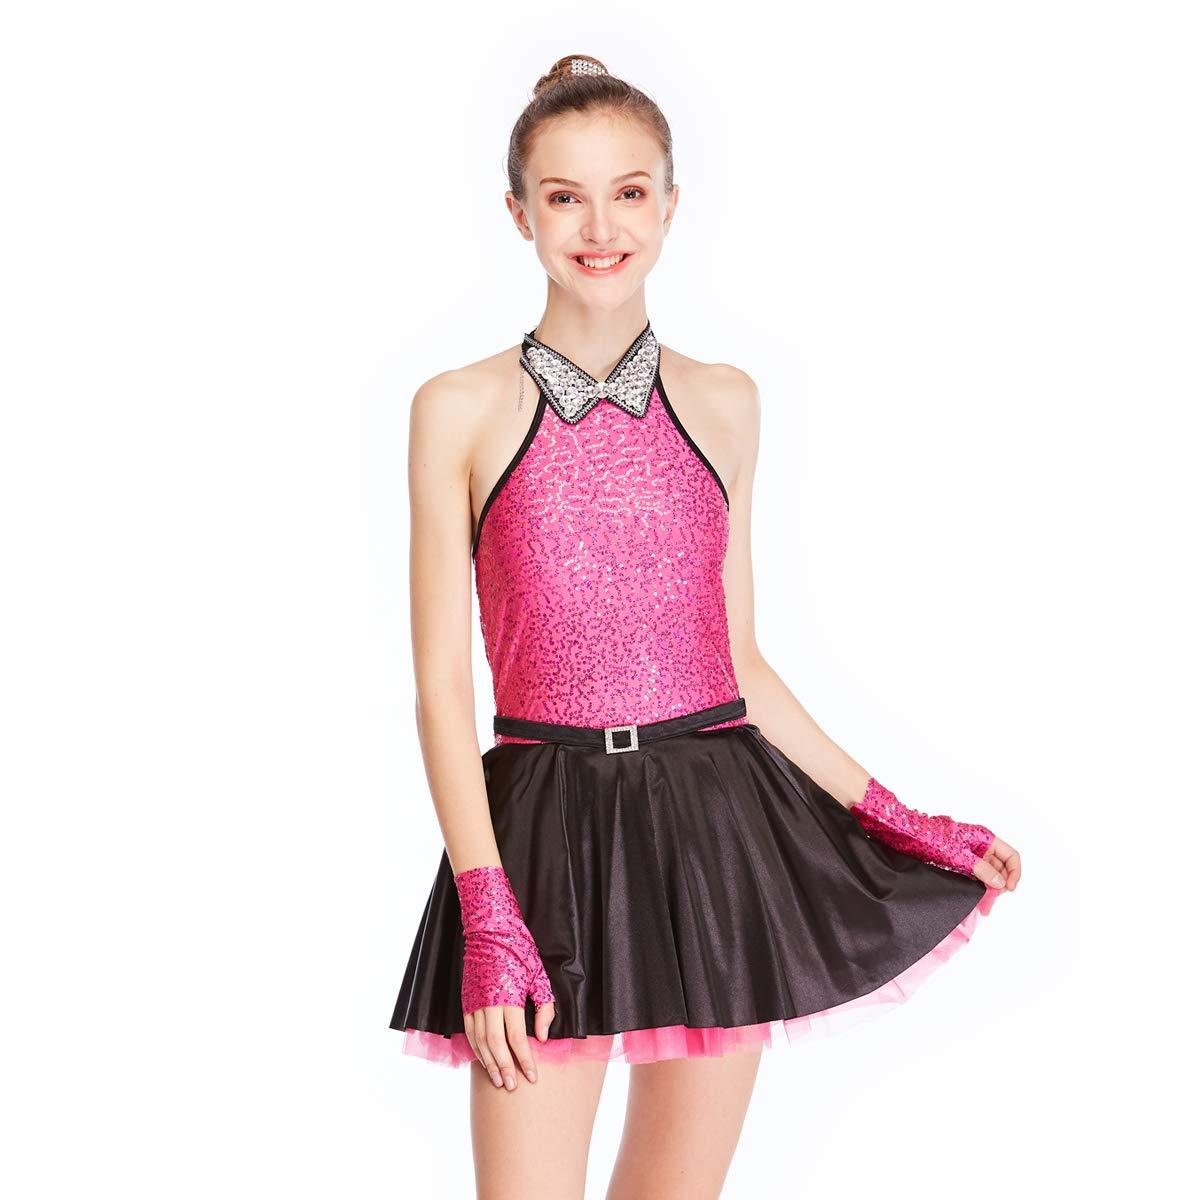 MiDee Jazz Dress Dance Costume High Neck with Sparkle Austria Rhinestones Collar (LC, HotPink) by MiDee